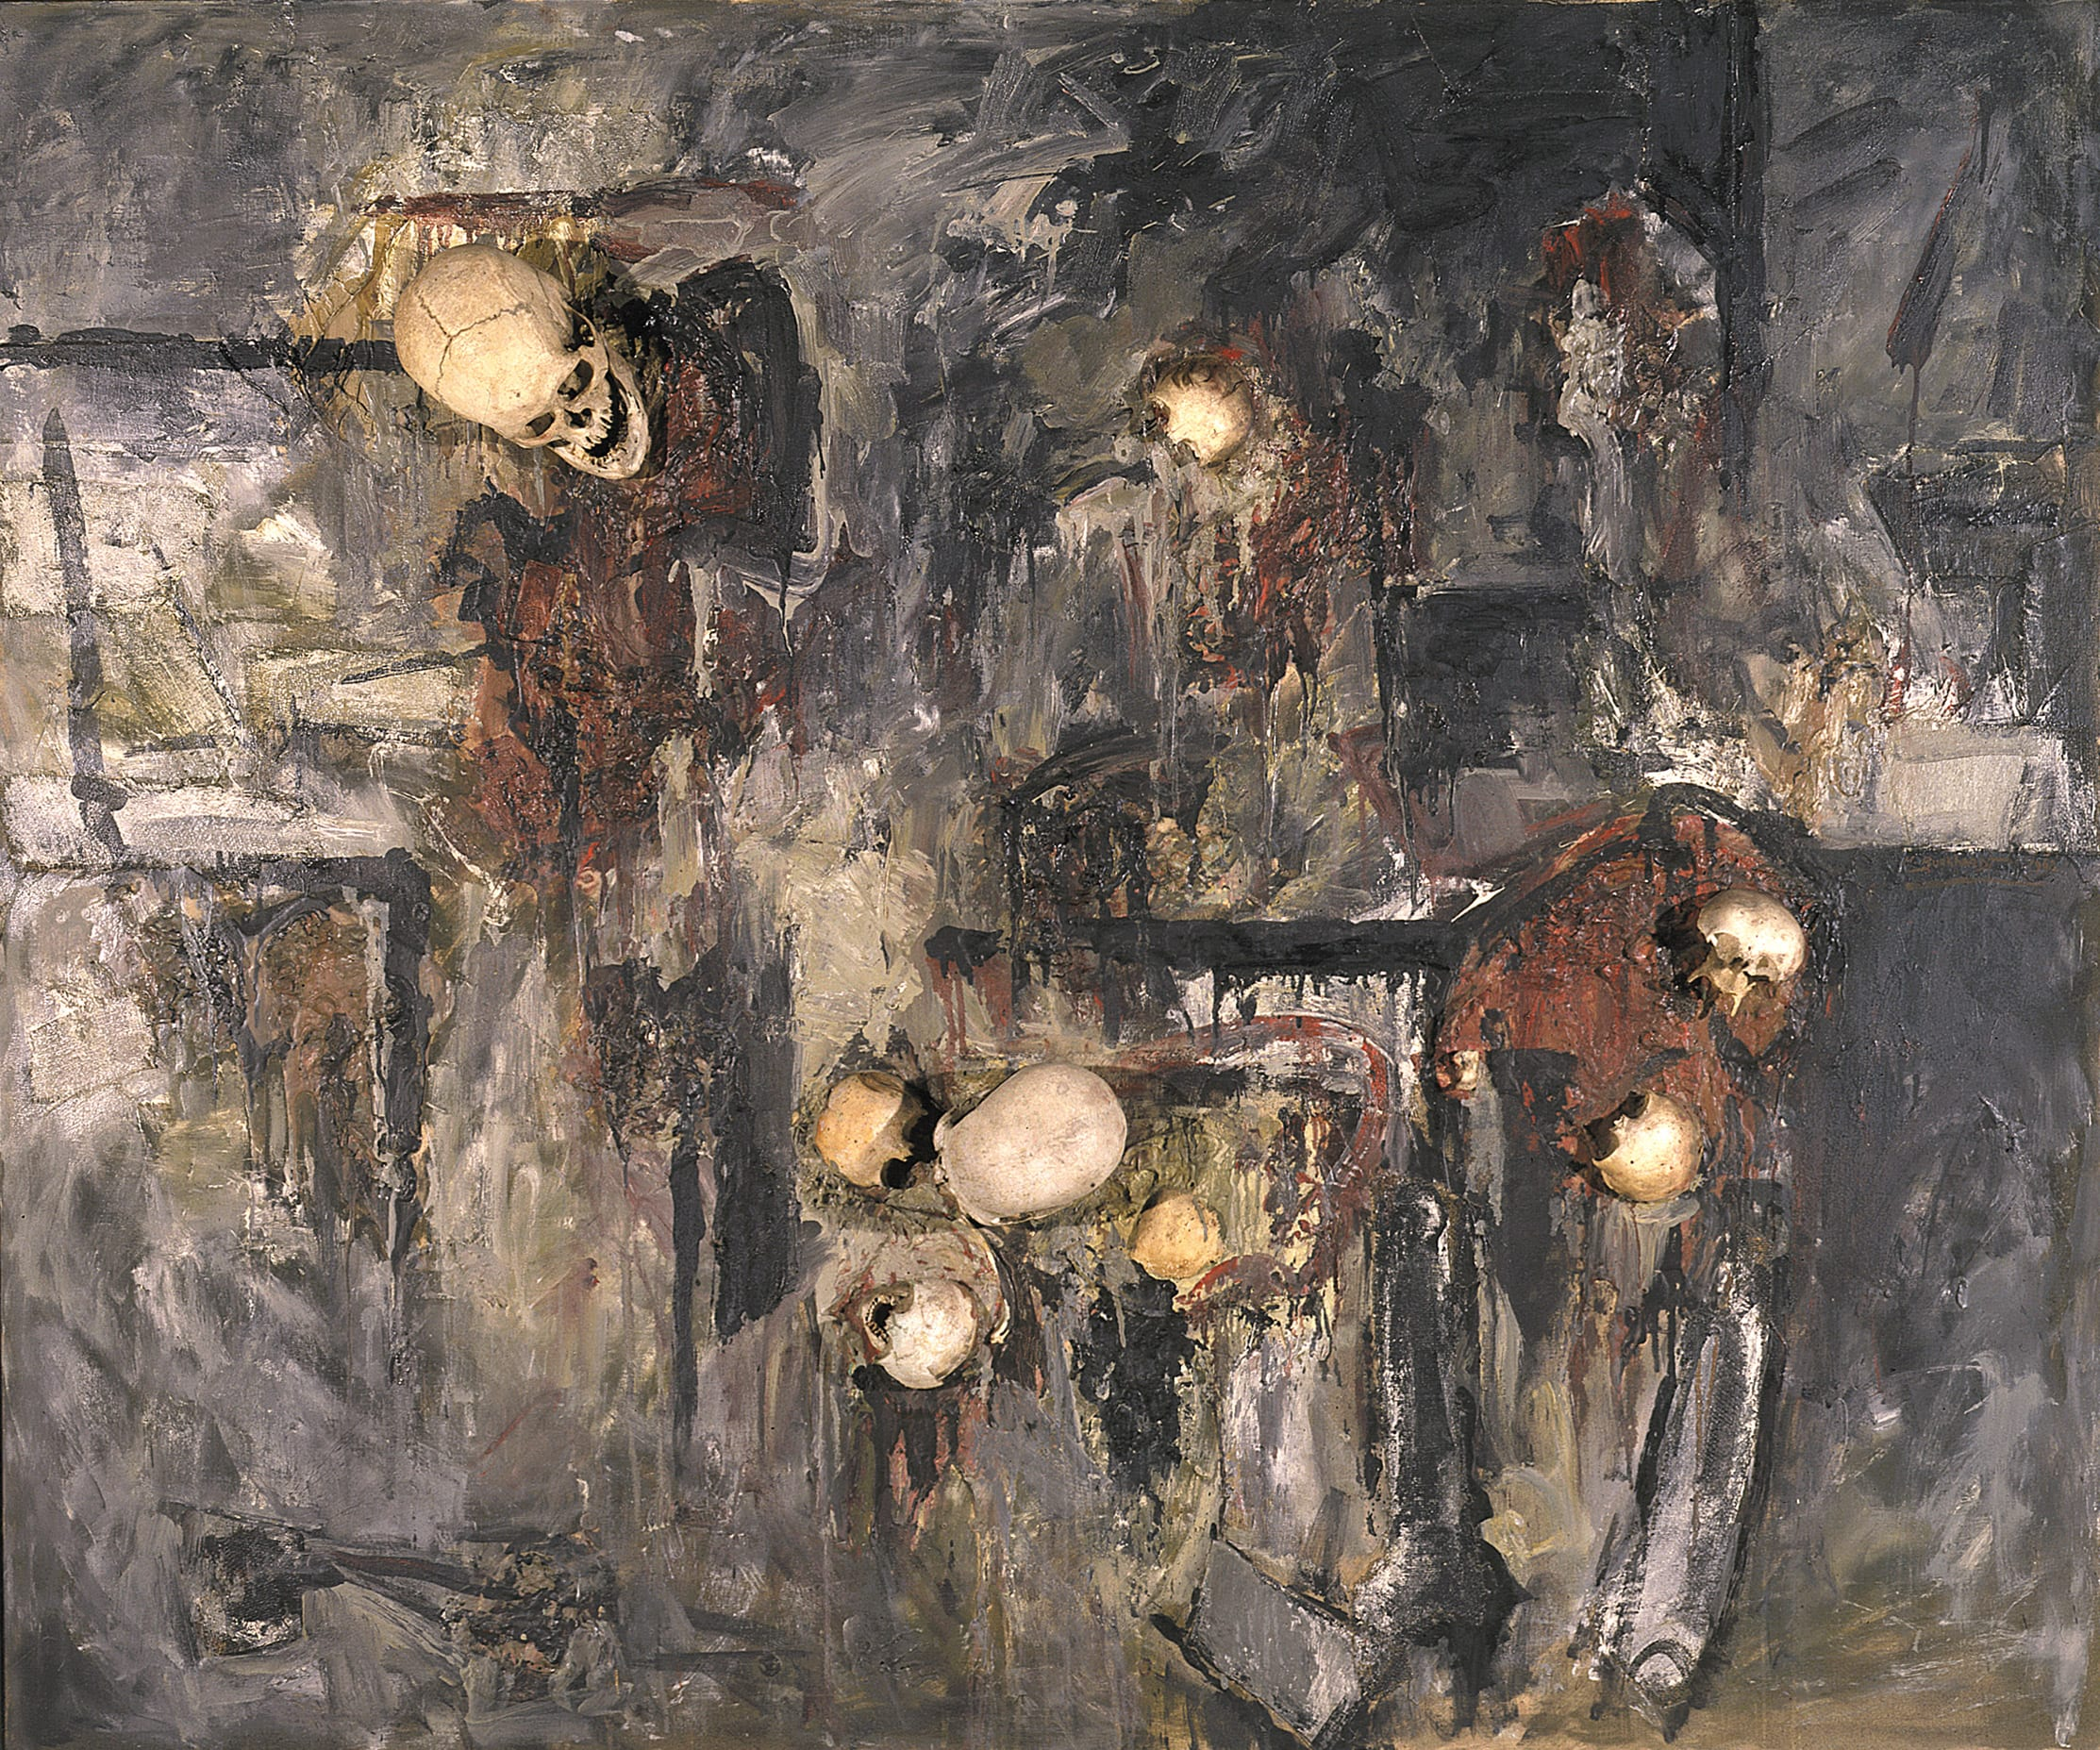 "Hans Burkhardt, Lang Vei, oil, assemblage with skulls on canvas, 60"" x 72"" x 8"", 1967-68."